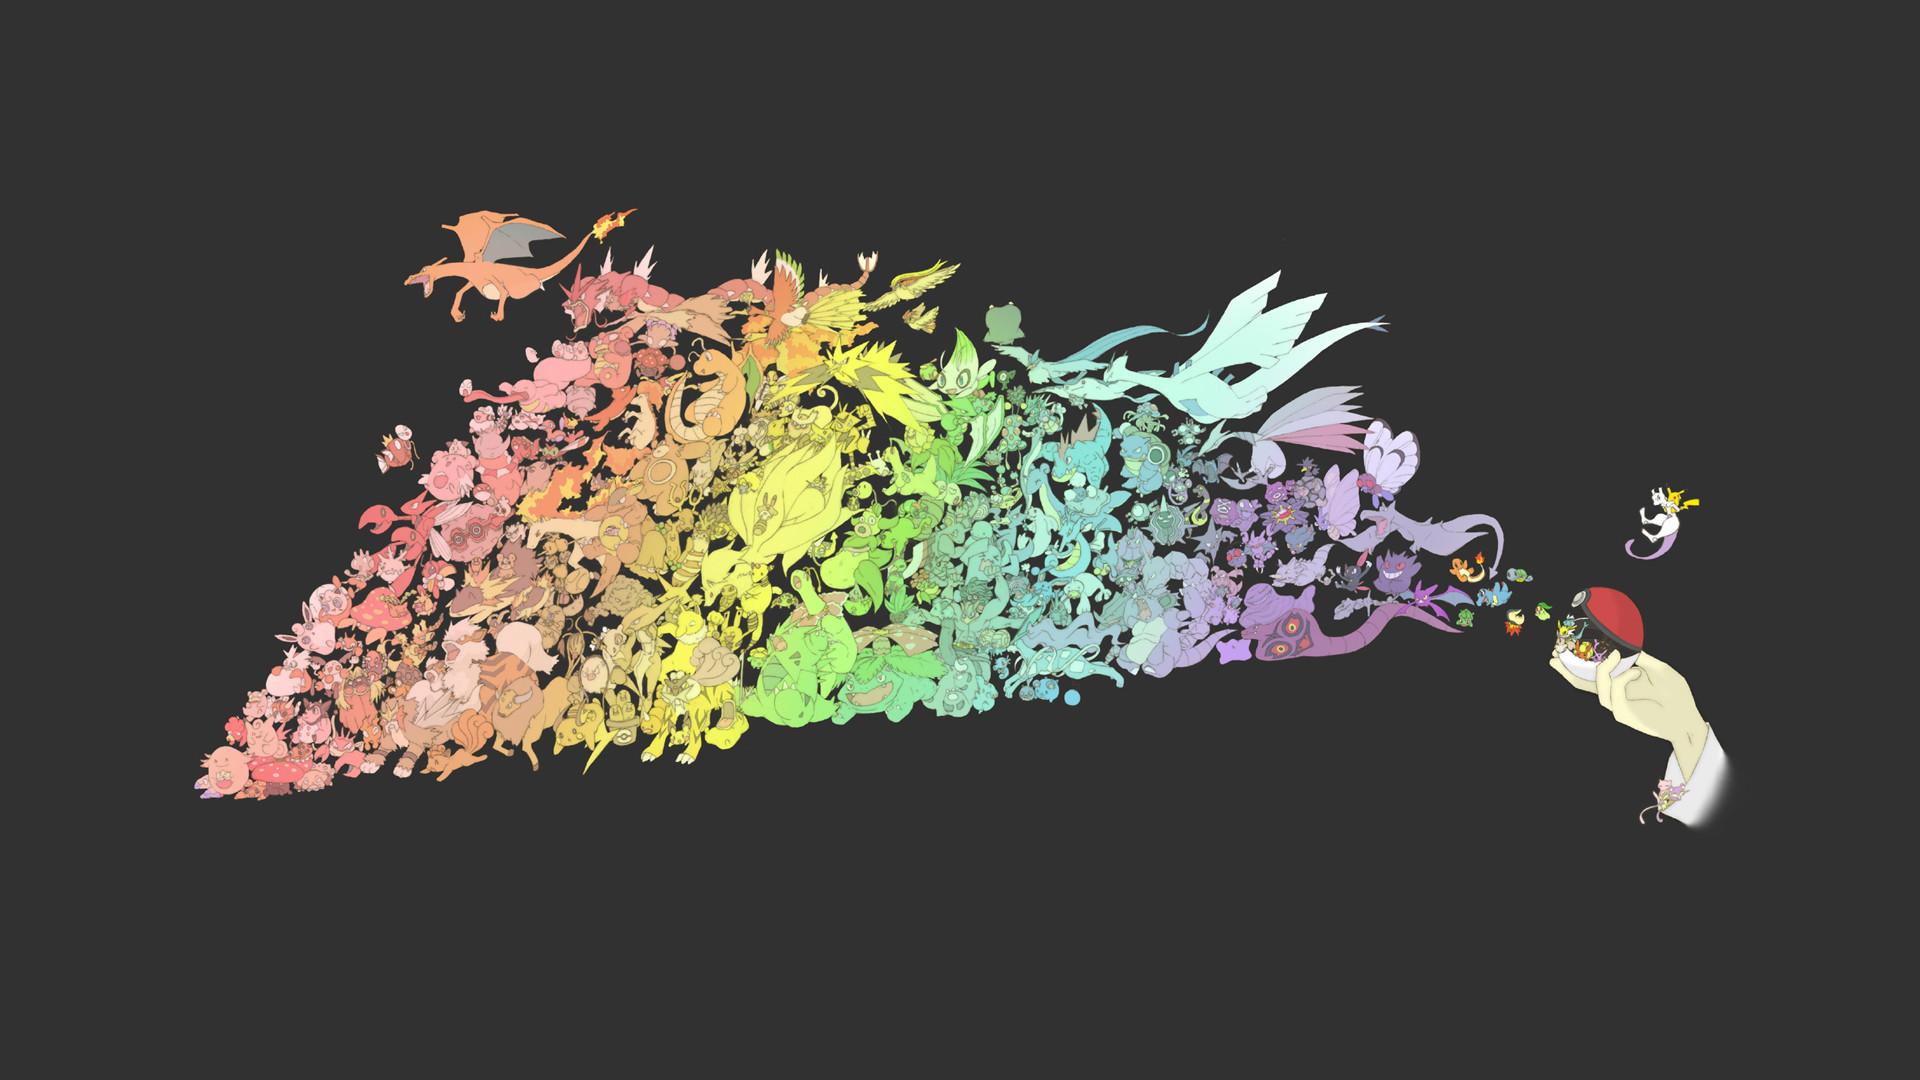 Pokemon-Legendary-Wallpaper-HD.jpg